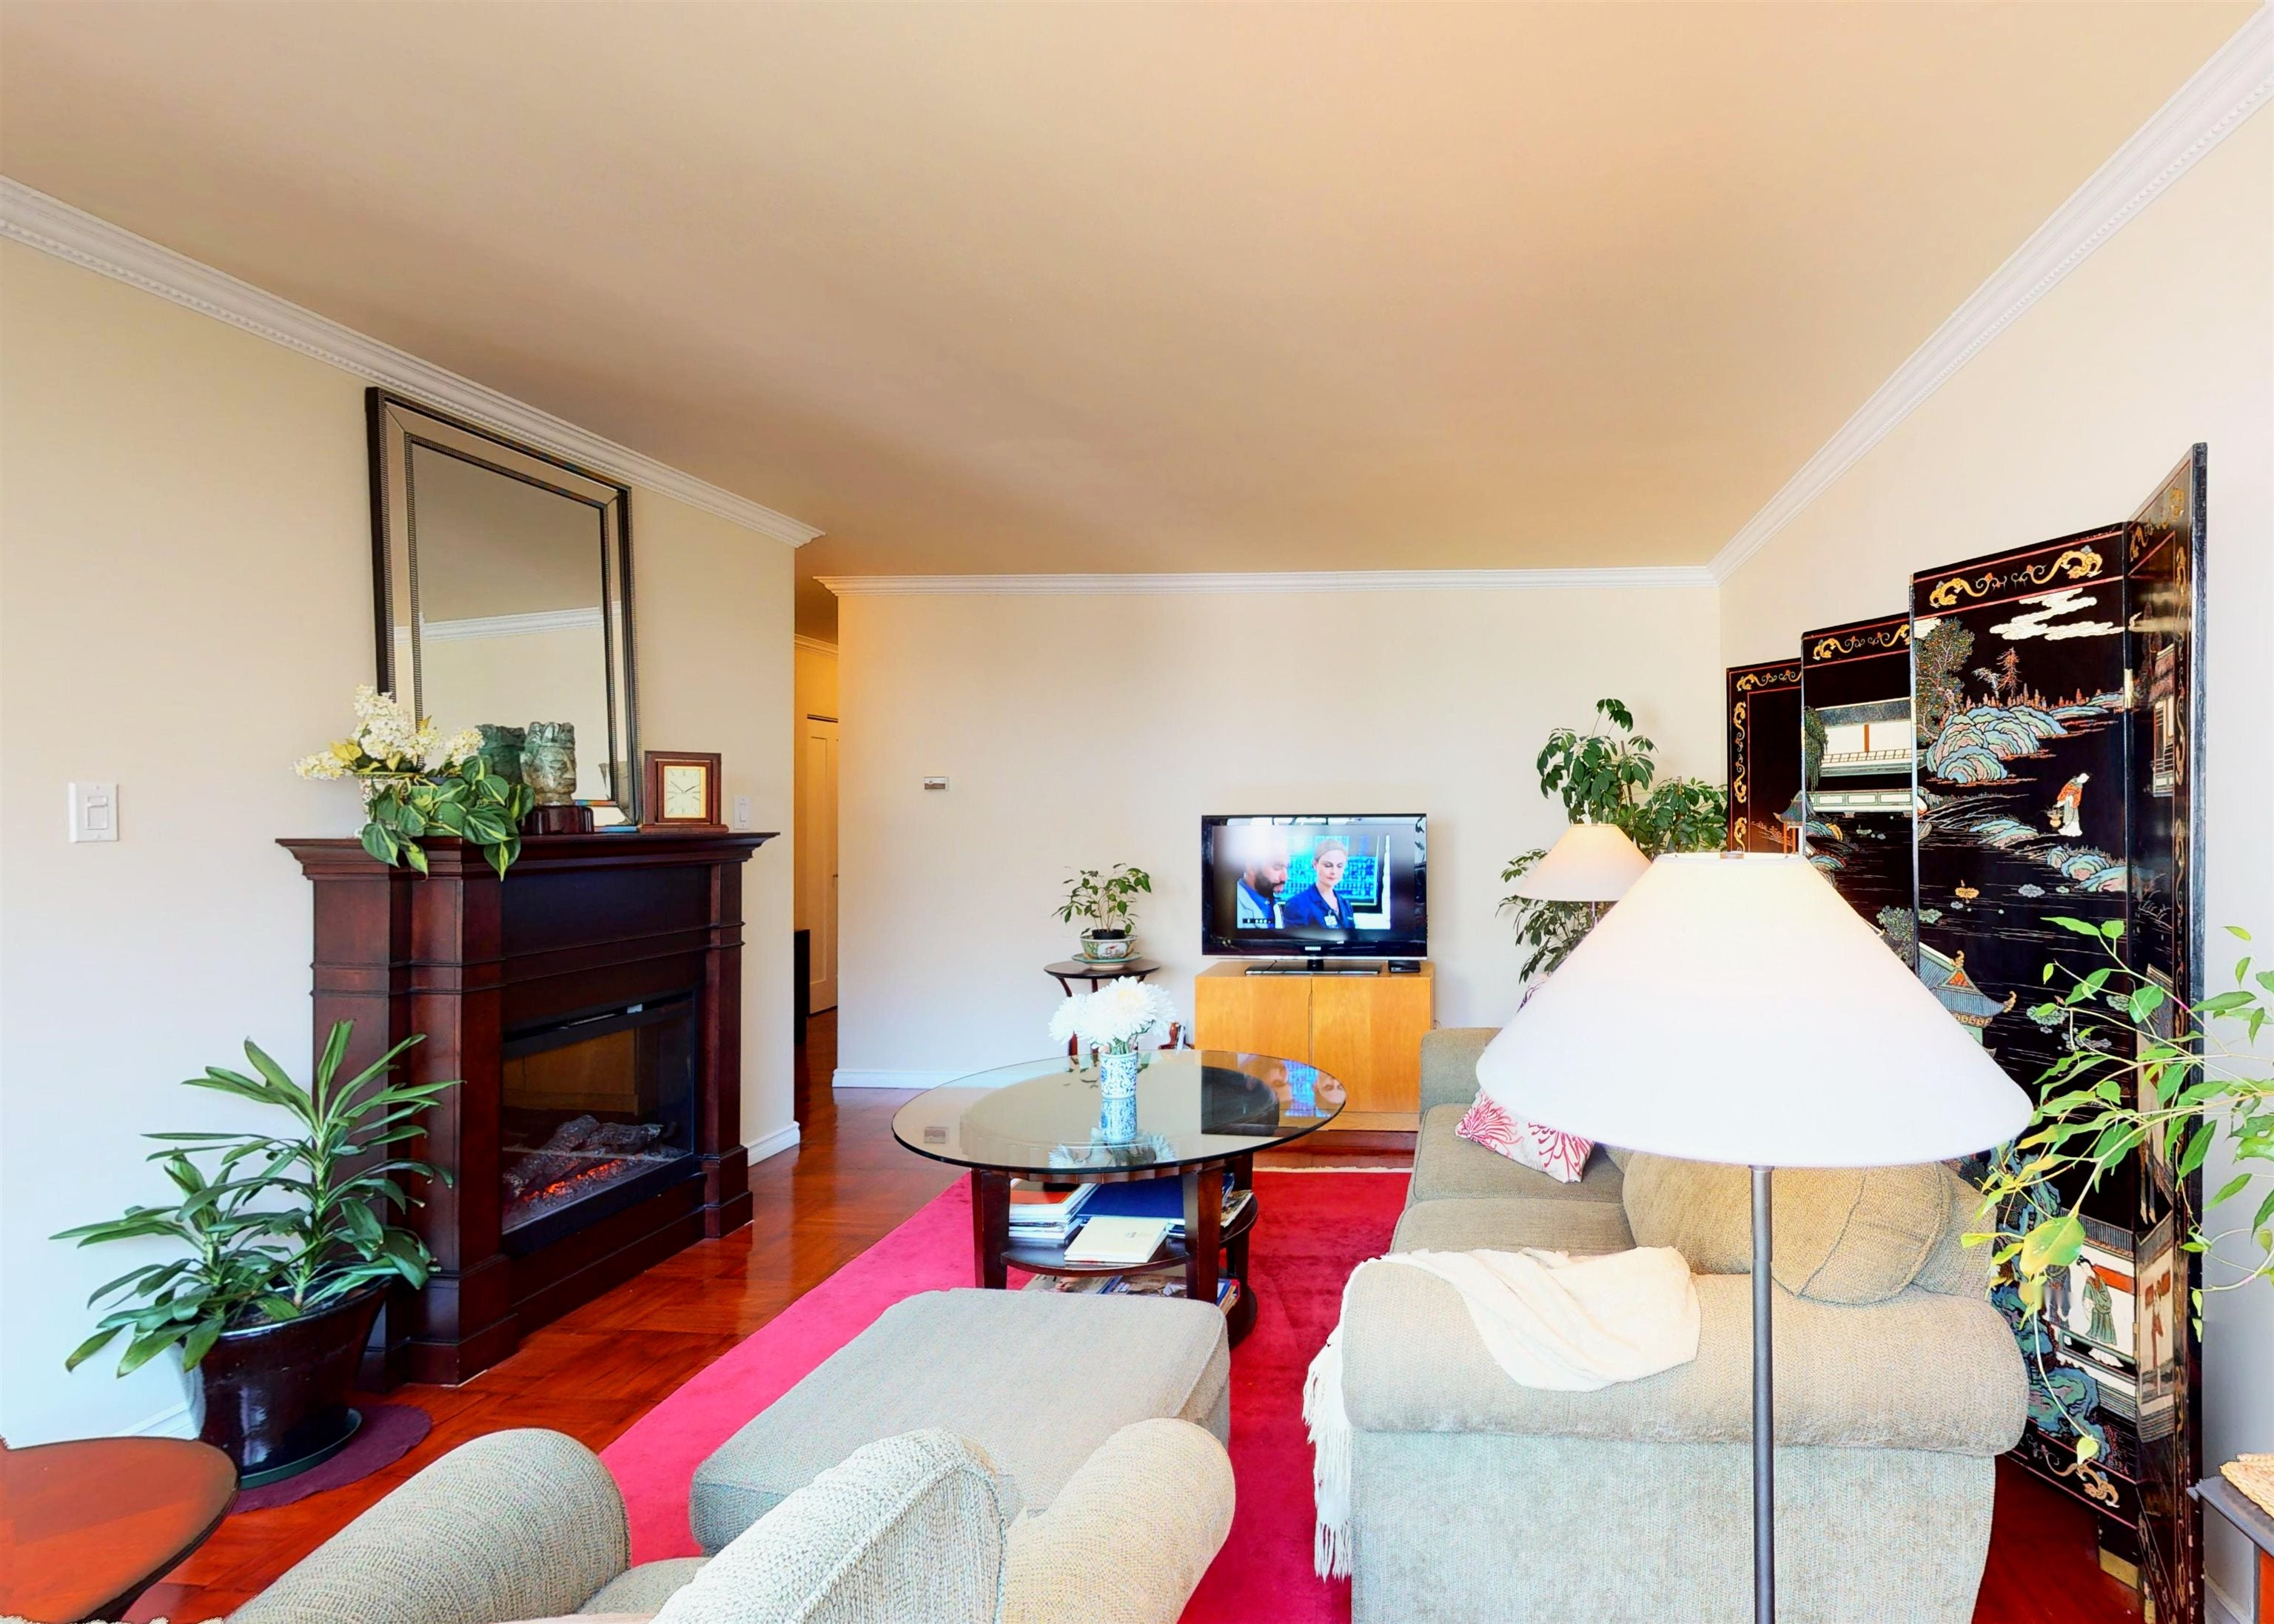 202 1750 ESQUIMALT AVENUE - Ambleside Apartment/Condo for sale, 1 Bedroom (R2610188) - #7